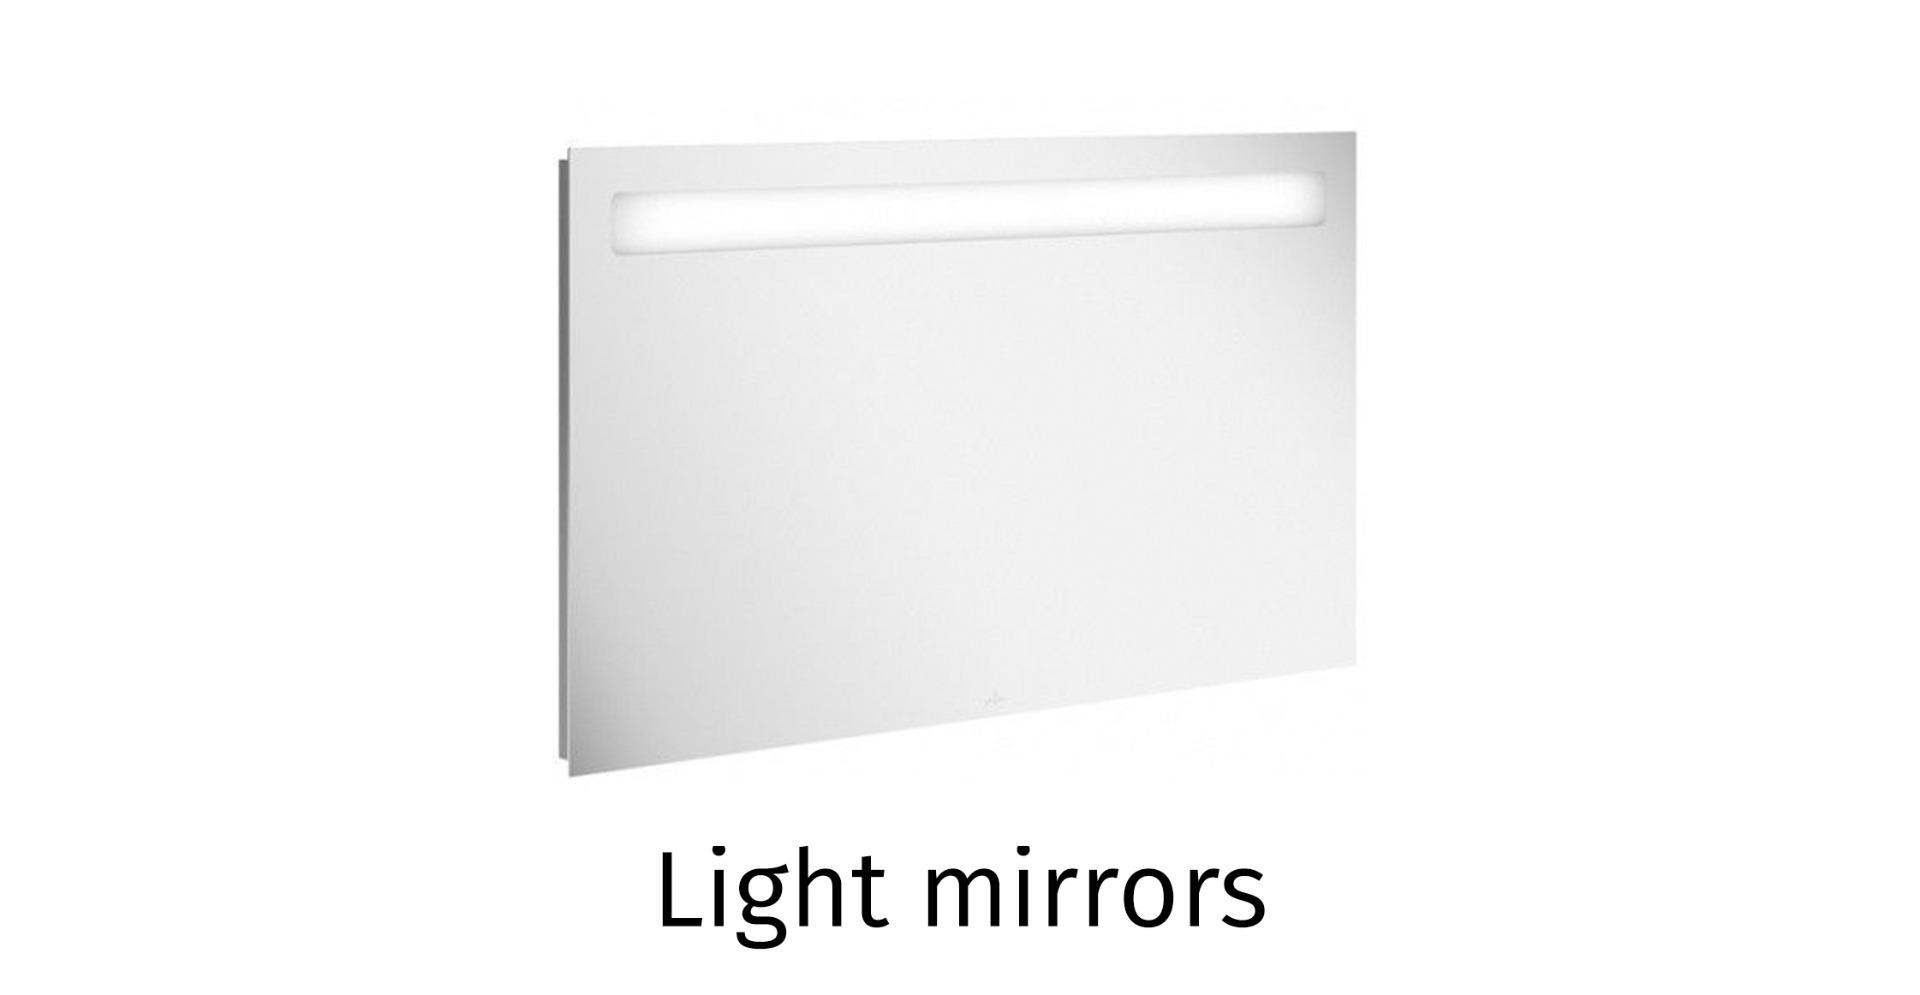 Light mirrors